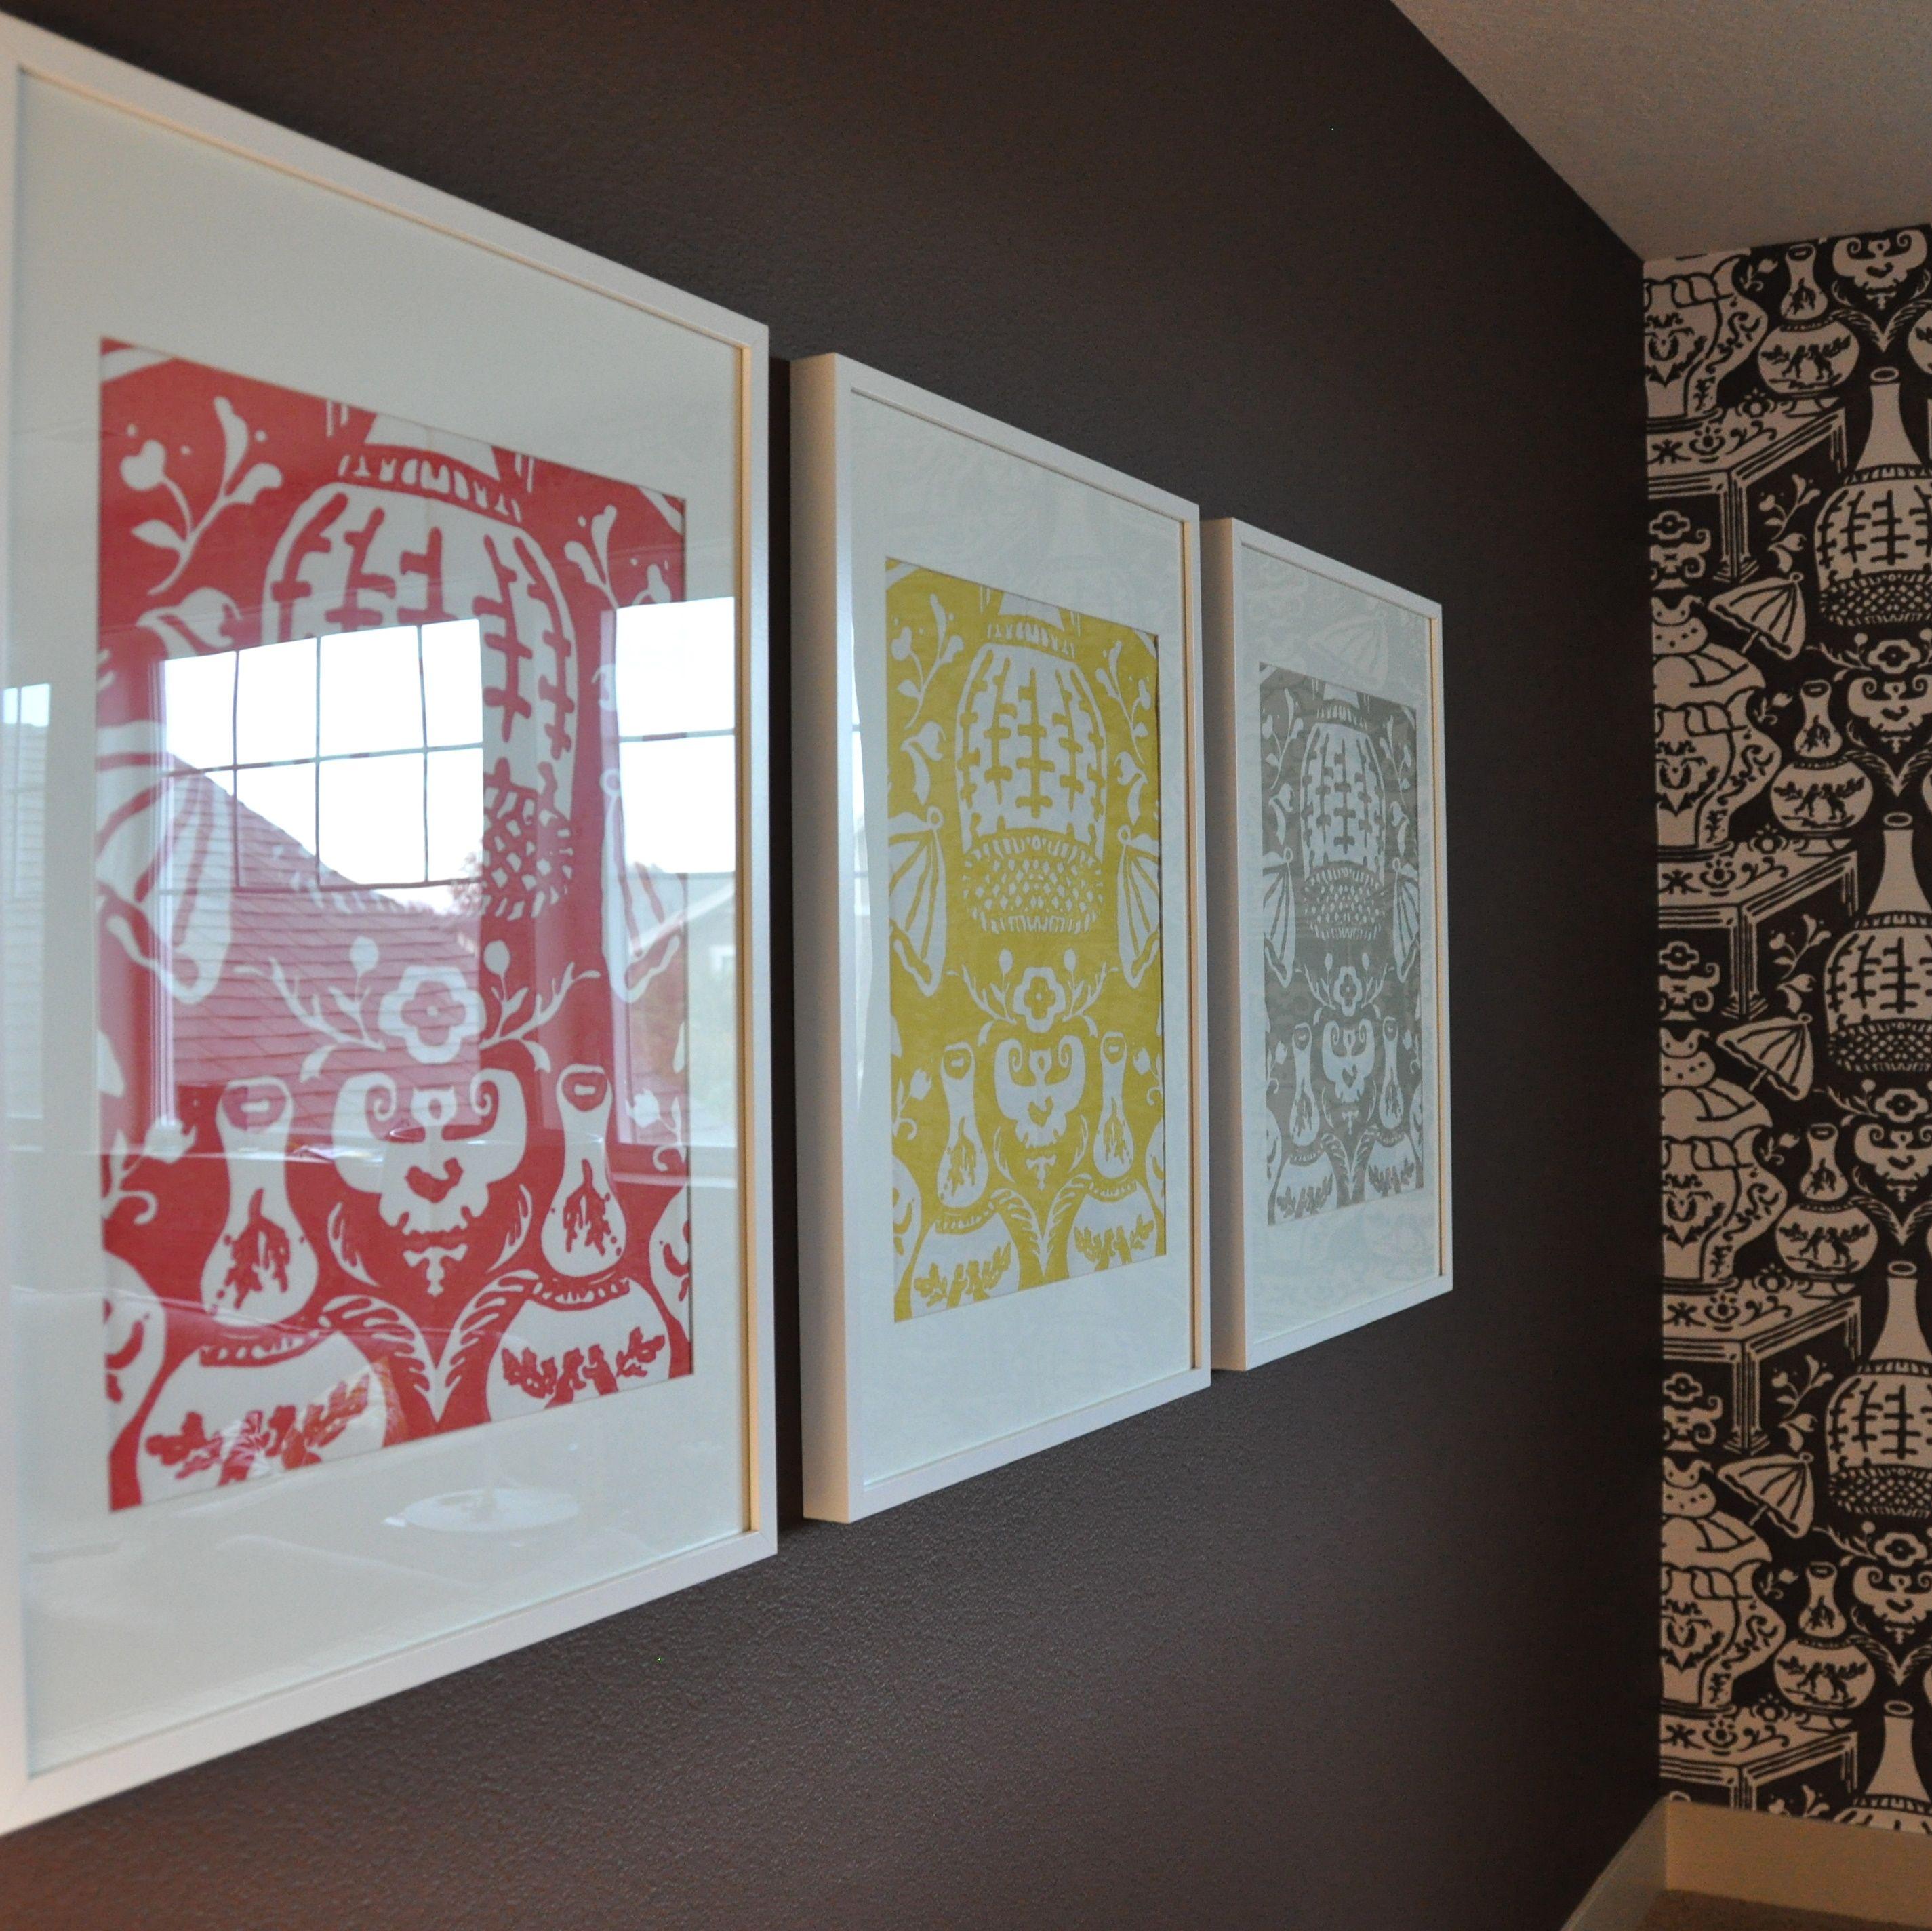 Modern interior wallpaper swatch - Wallpaper Samples In Ikea Ribba Frames Simple Fun